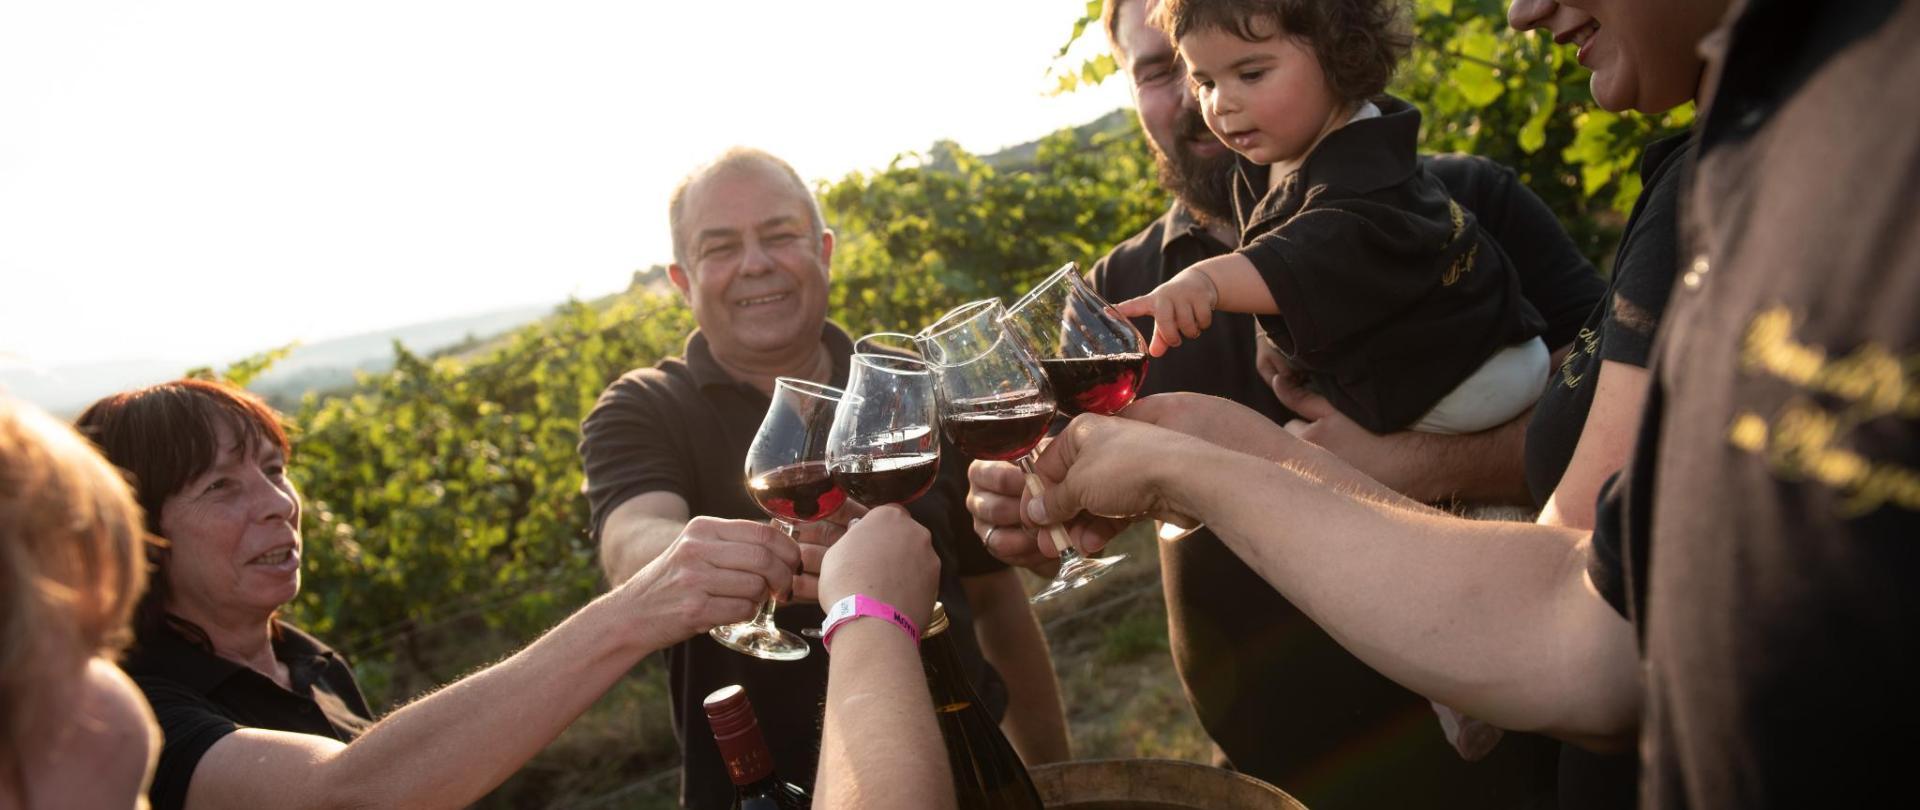 Weinschlößchen im Weingut Roos